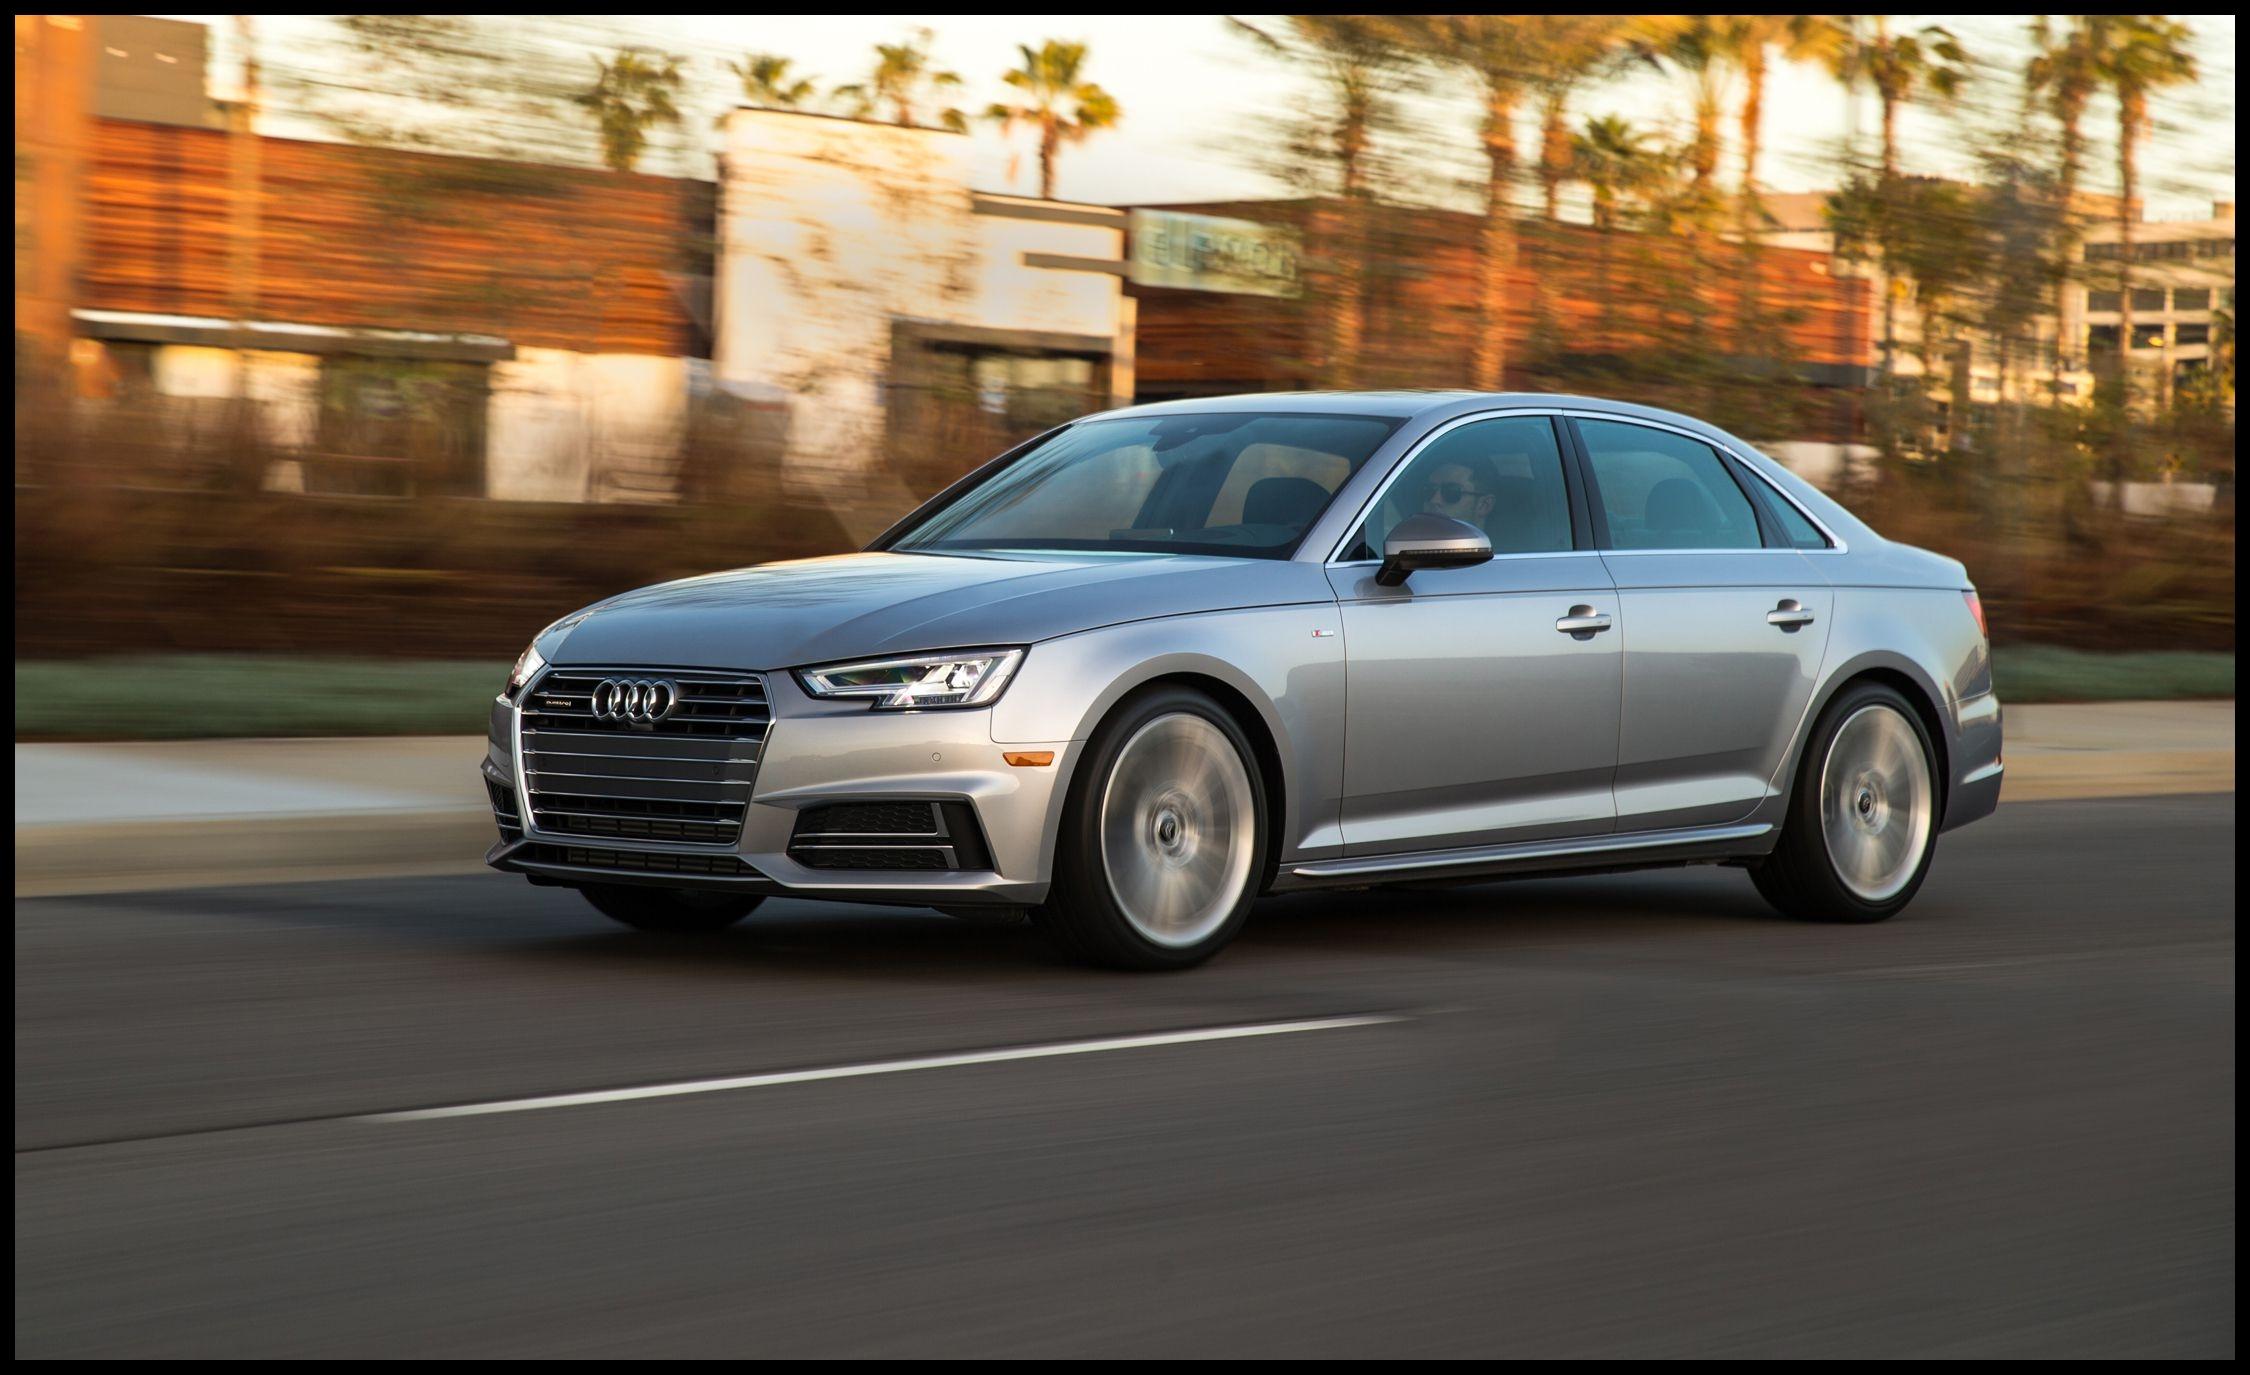 2017 audi a4 in depth model review car and driver photo s original